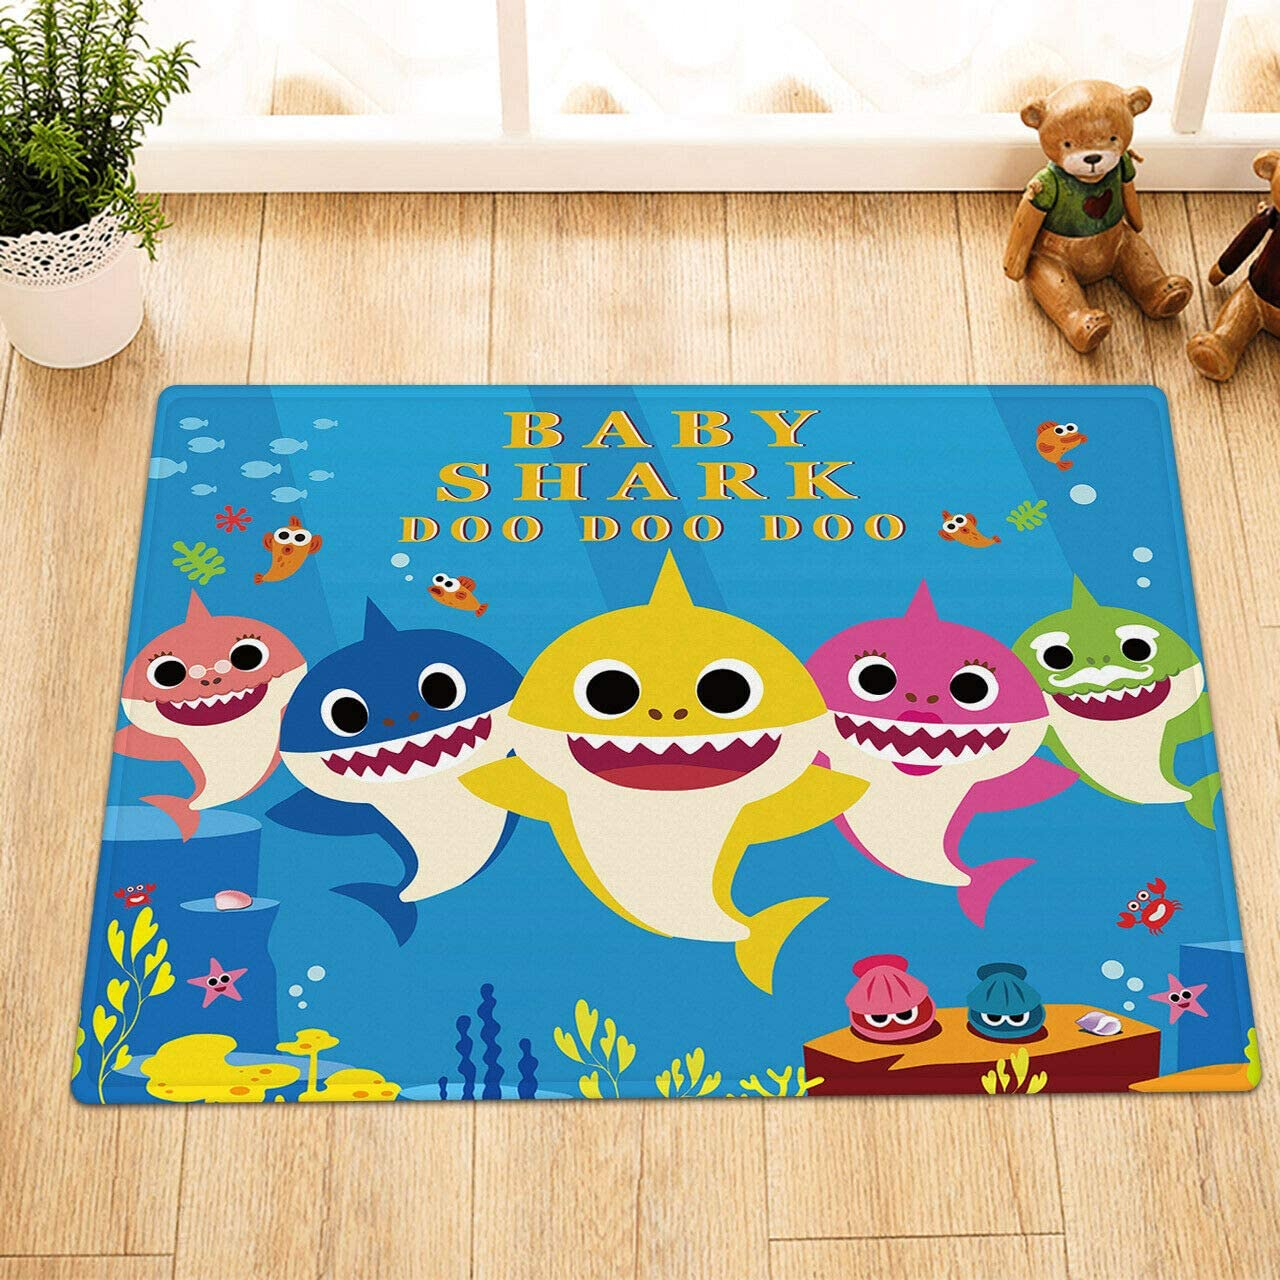 CDHBH Cartoon Baby Shark Blue sea Bottom Home Hotel Room Door Floor mat Bathroom Bedroom Kitchen Living Room Children's Carpet Non-Slip Material Flannel 40x60cm